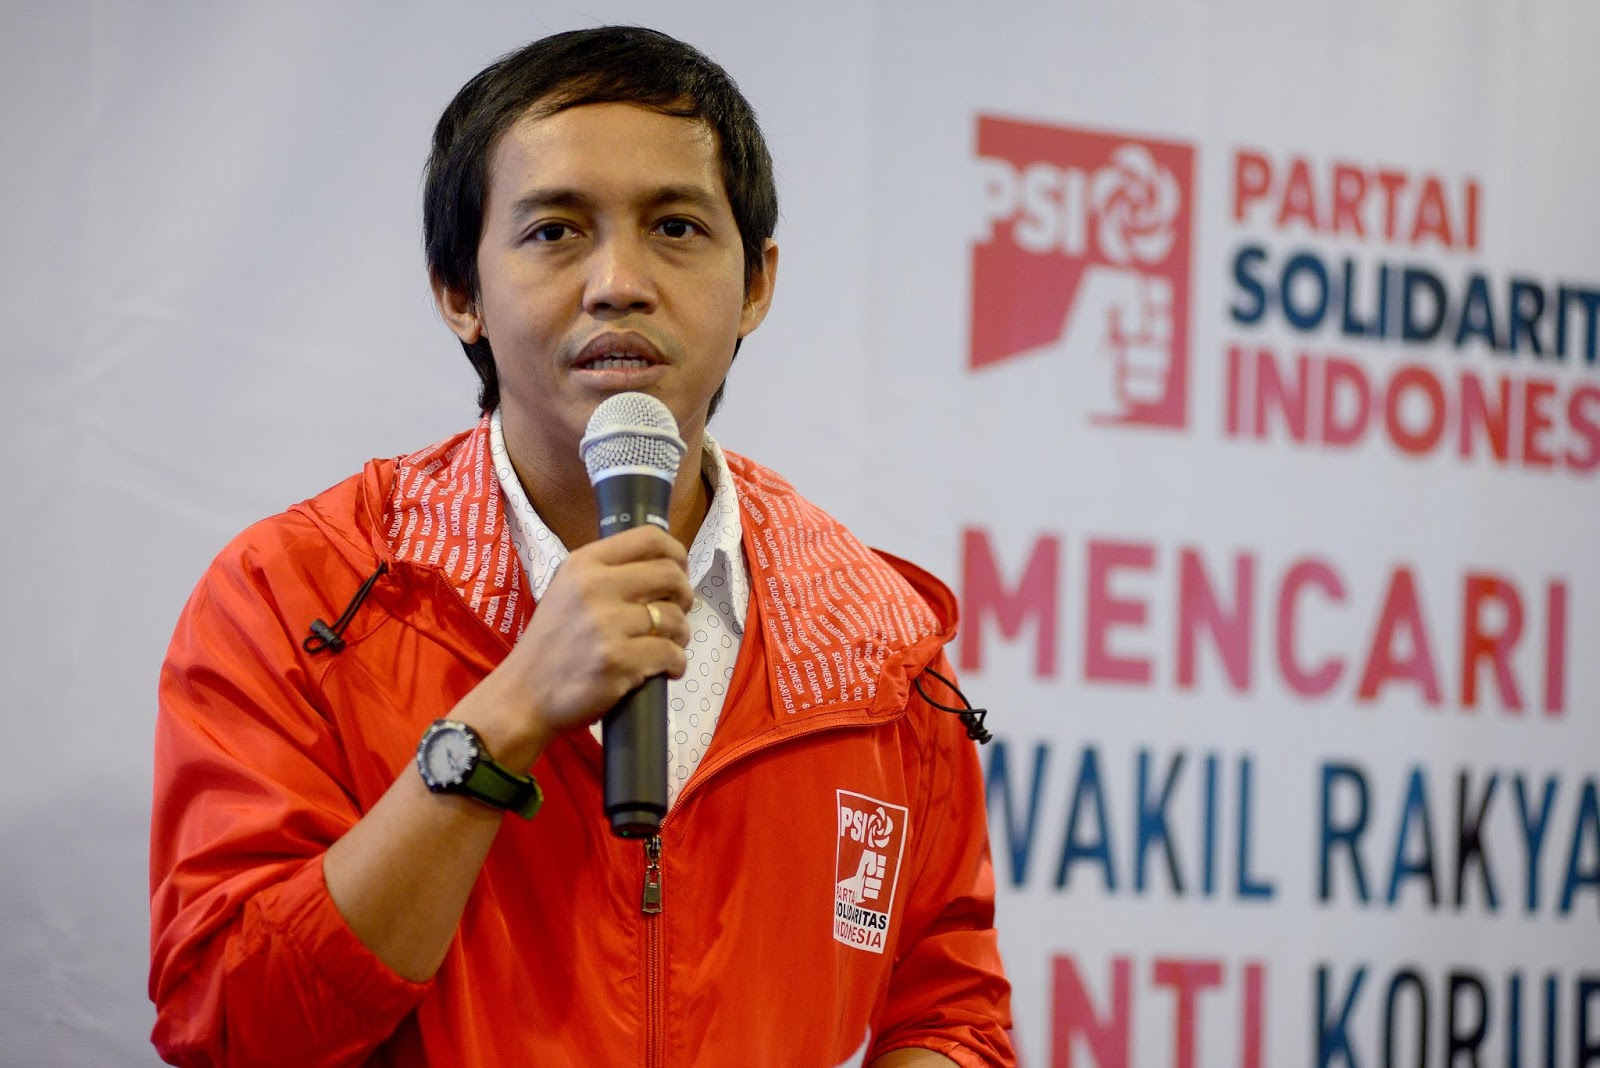 Pembebasan Ustadz Ba'asyir Ditinjau Ulang, Ini Tanggapan PSI